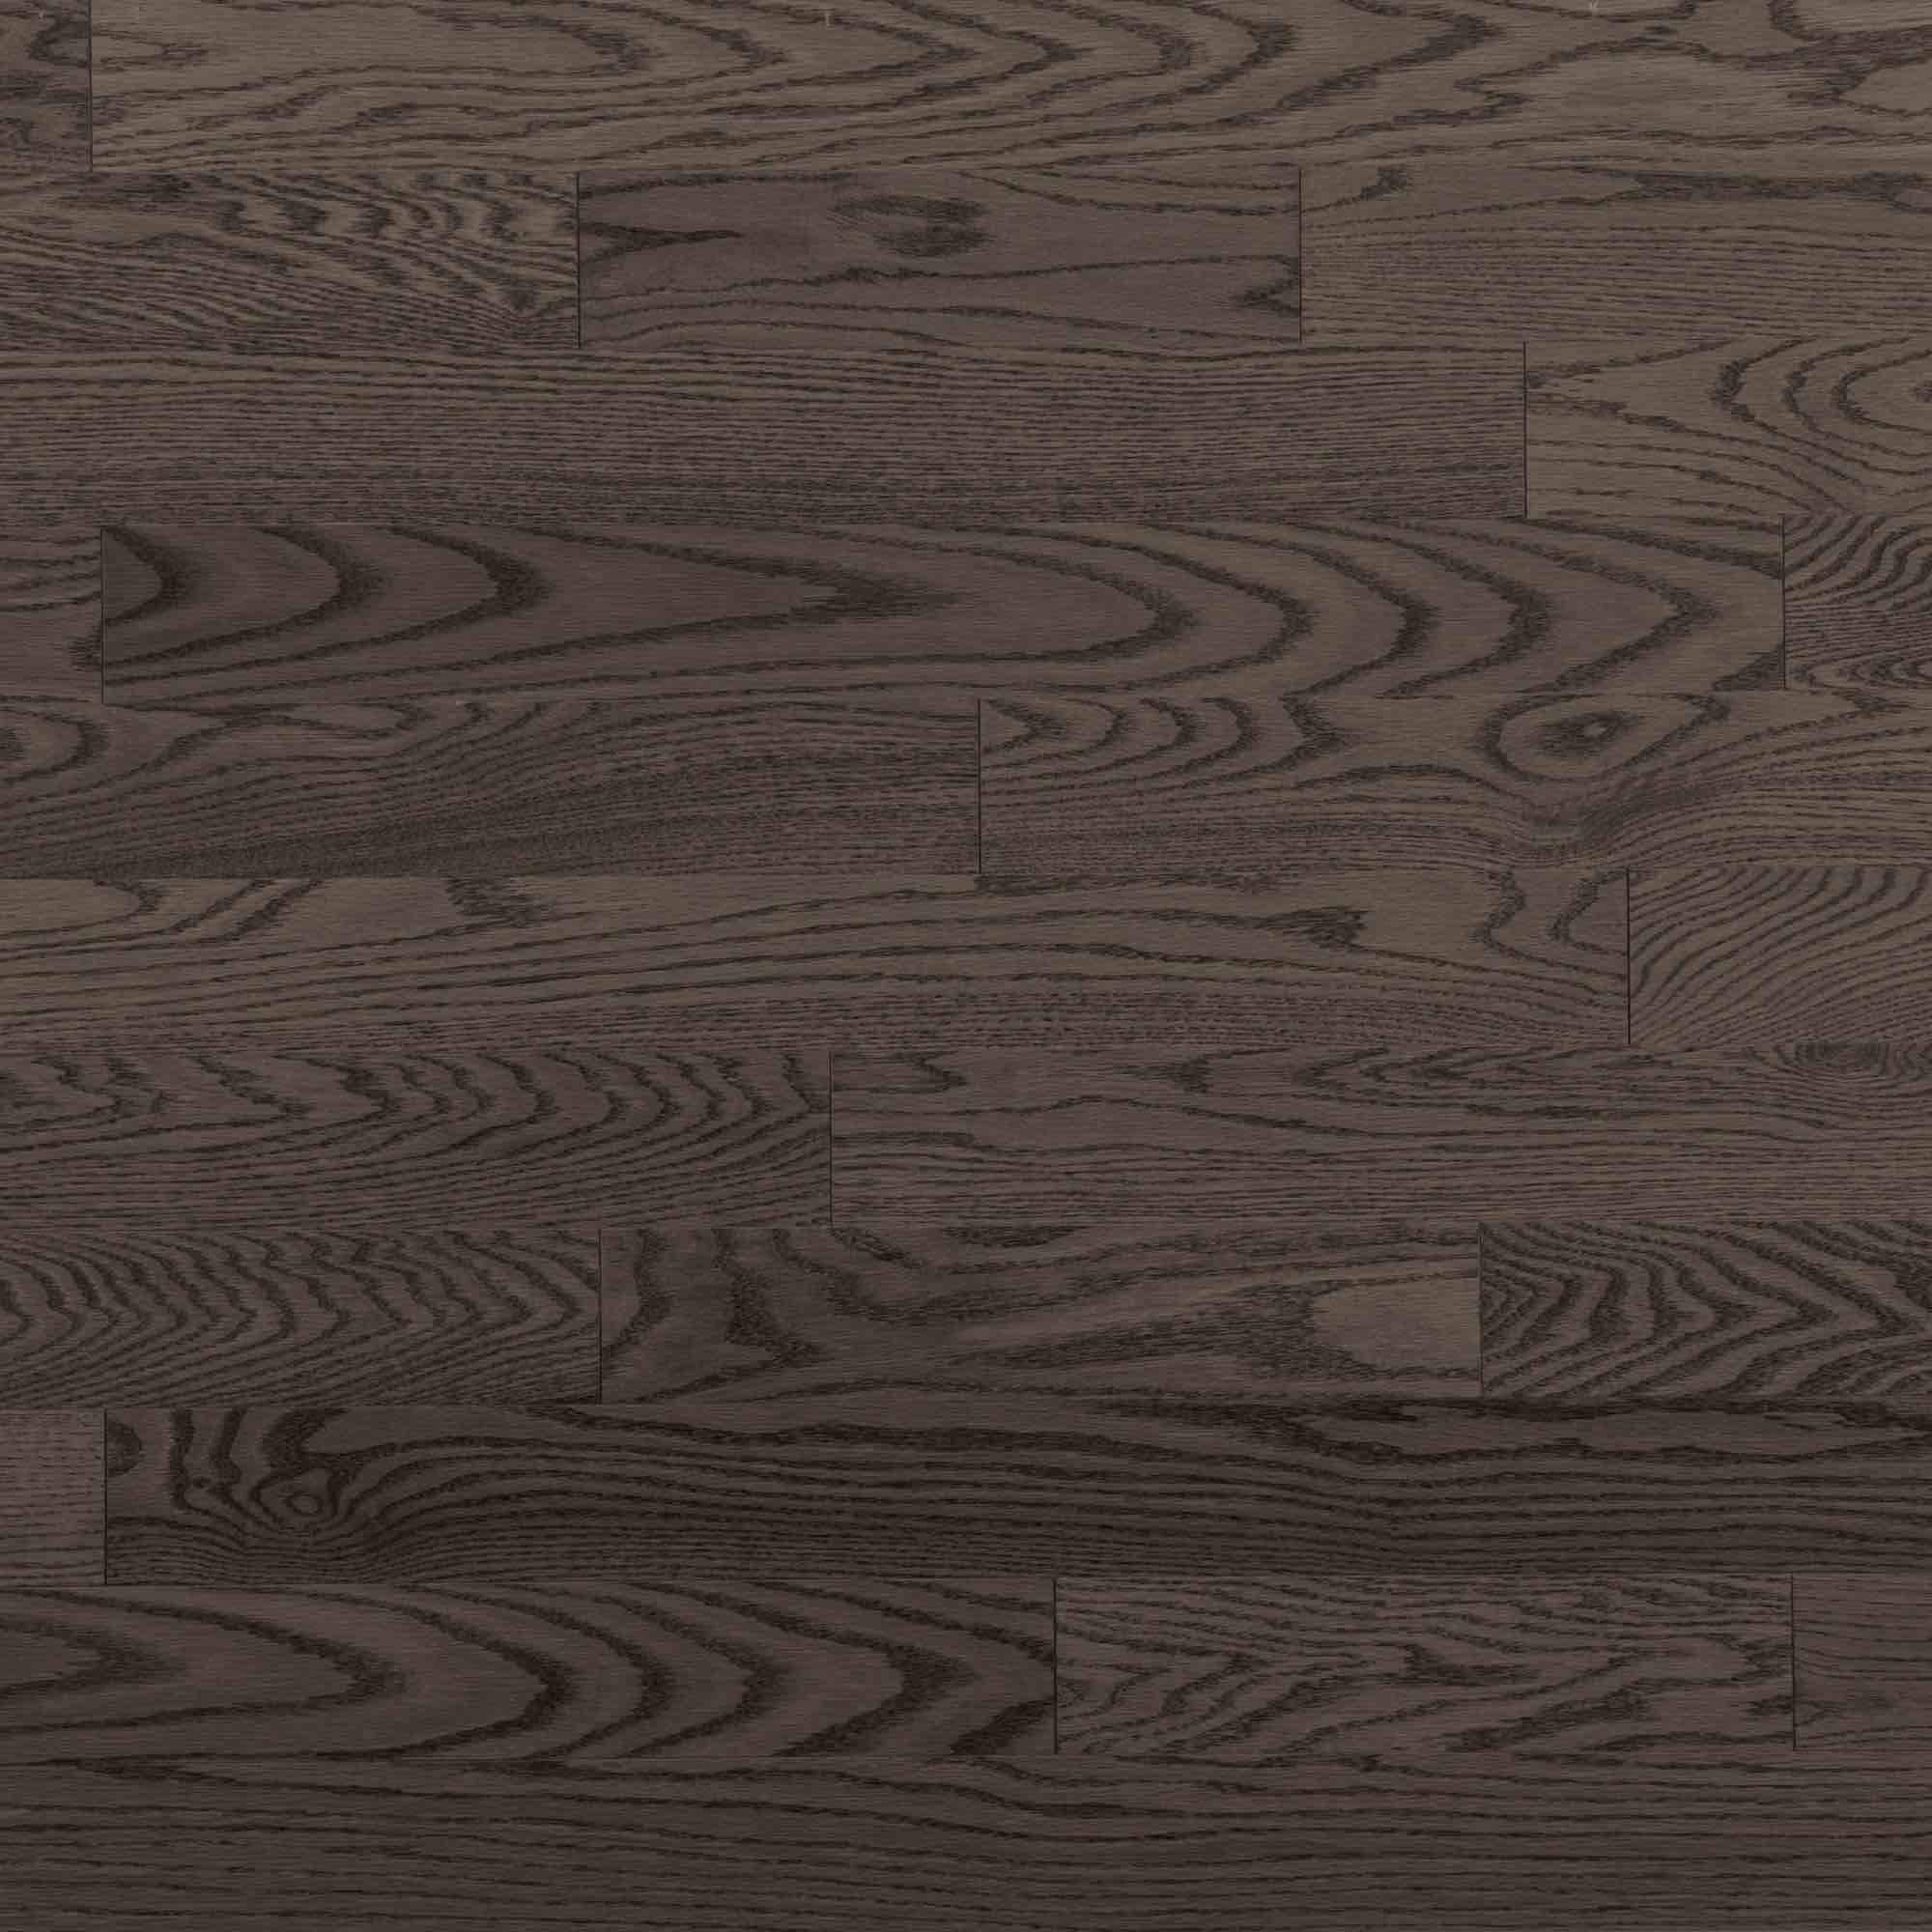 is bamboo flooring cheaper than hardwood of hardwood westfloors west vancouver hardwood flooring carpet within to hardwood flooring featured hardwoods red oak charcoal